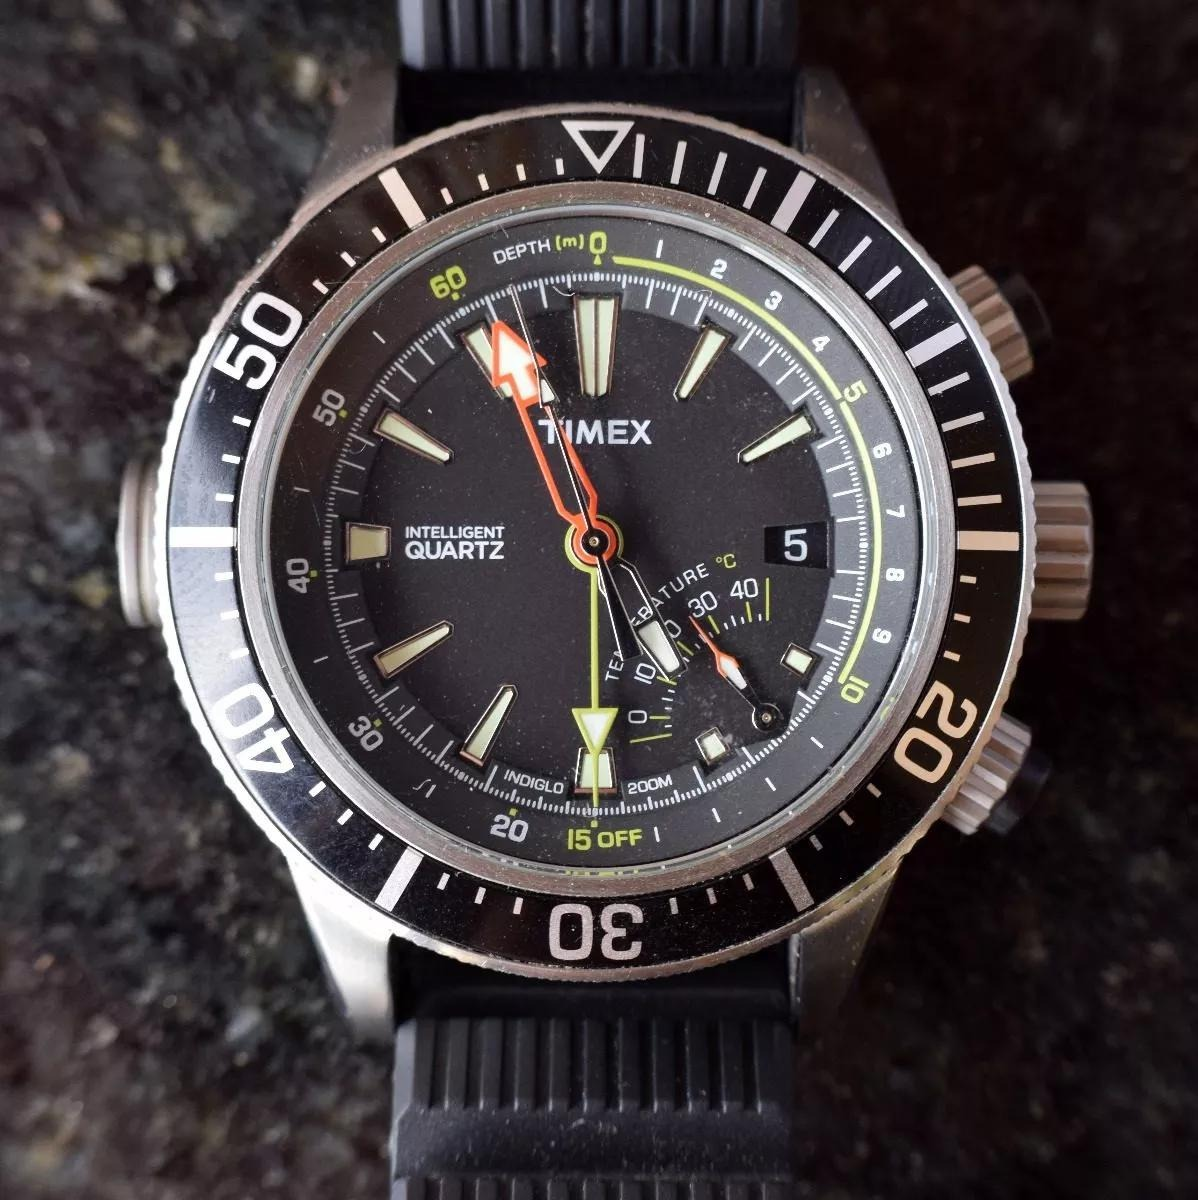 3452e992404 relógio timex intelligent quartz - t2n810 - profundímetro. Carregando zoom.